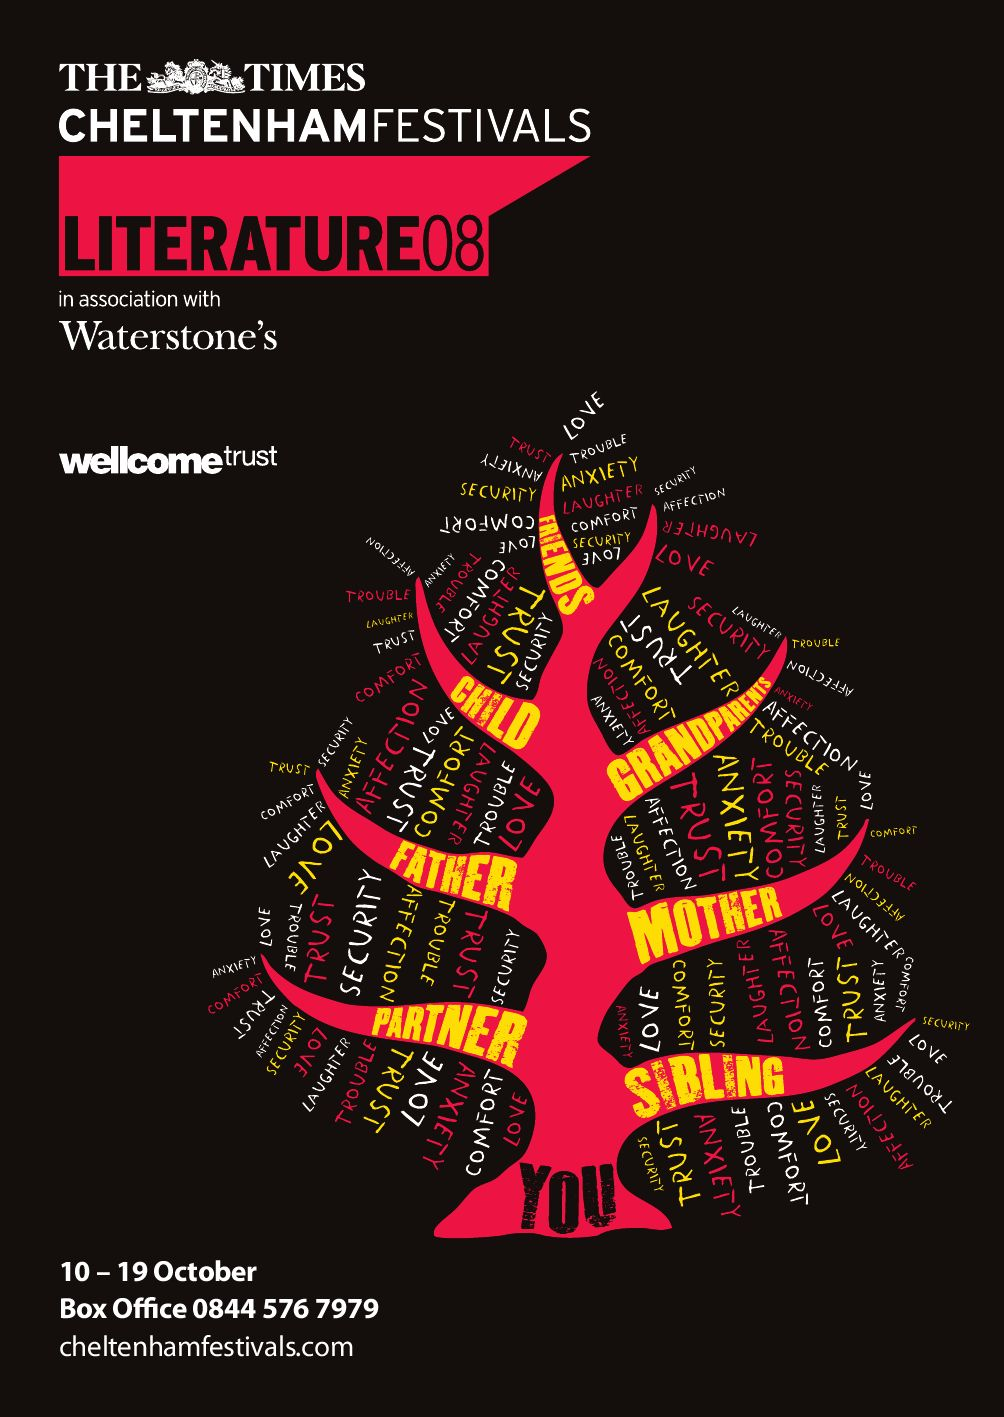 Cheltenham Literature Festival brochure 2008 by Cheltenham